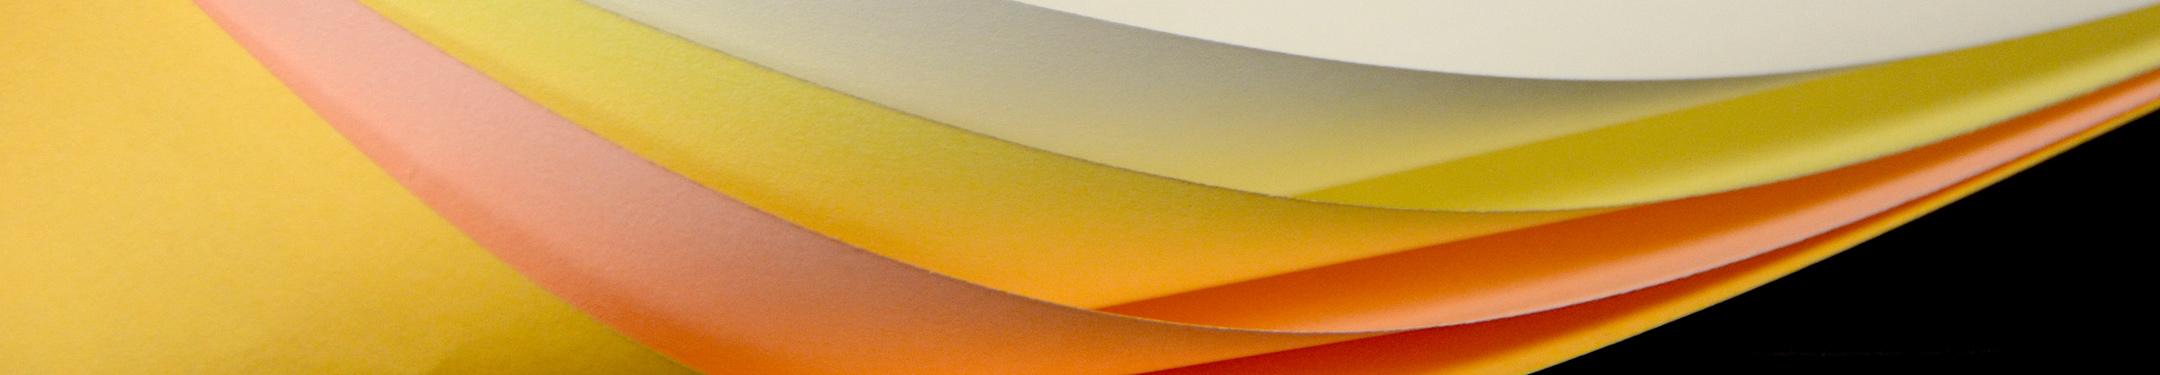 NCR Paper* Brand Xero/Form II